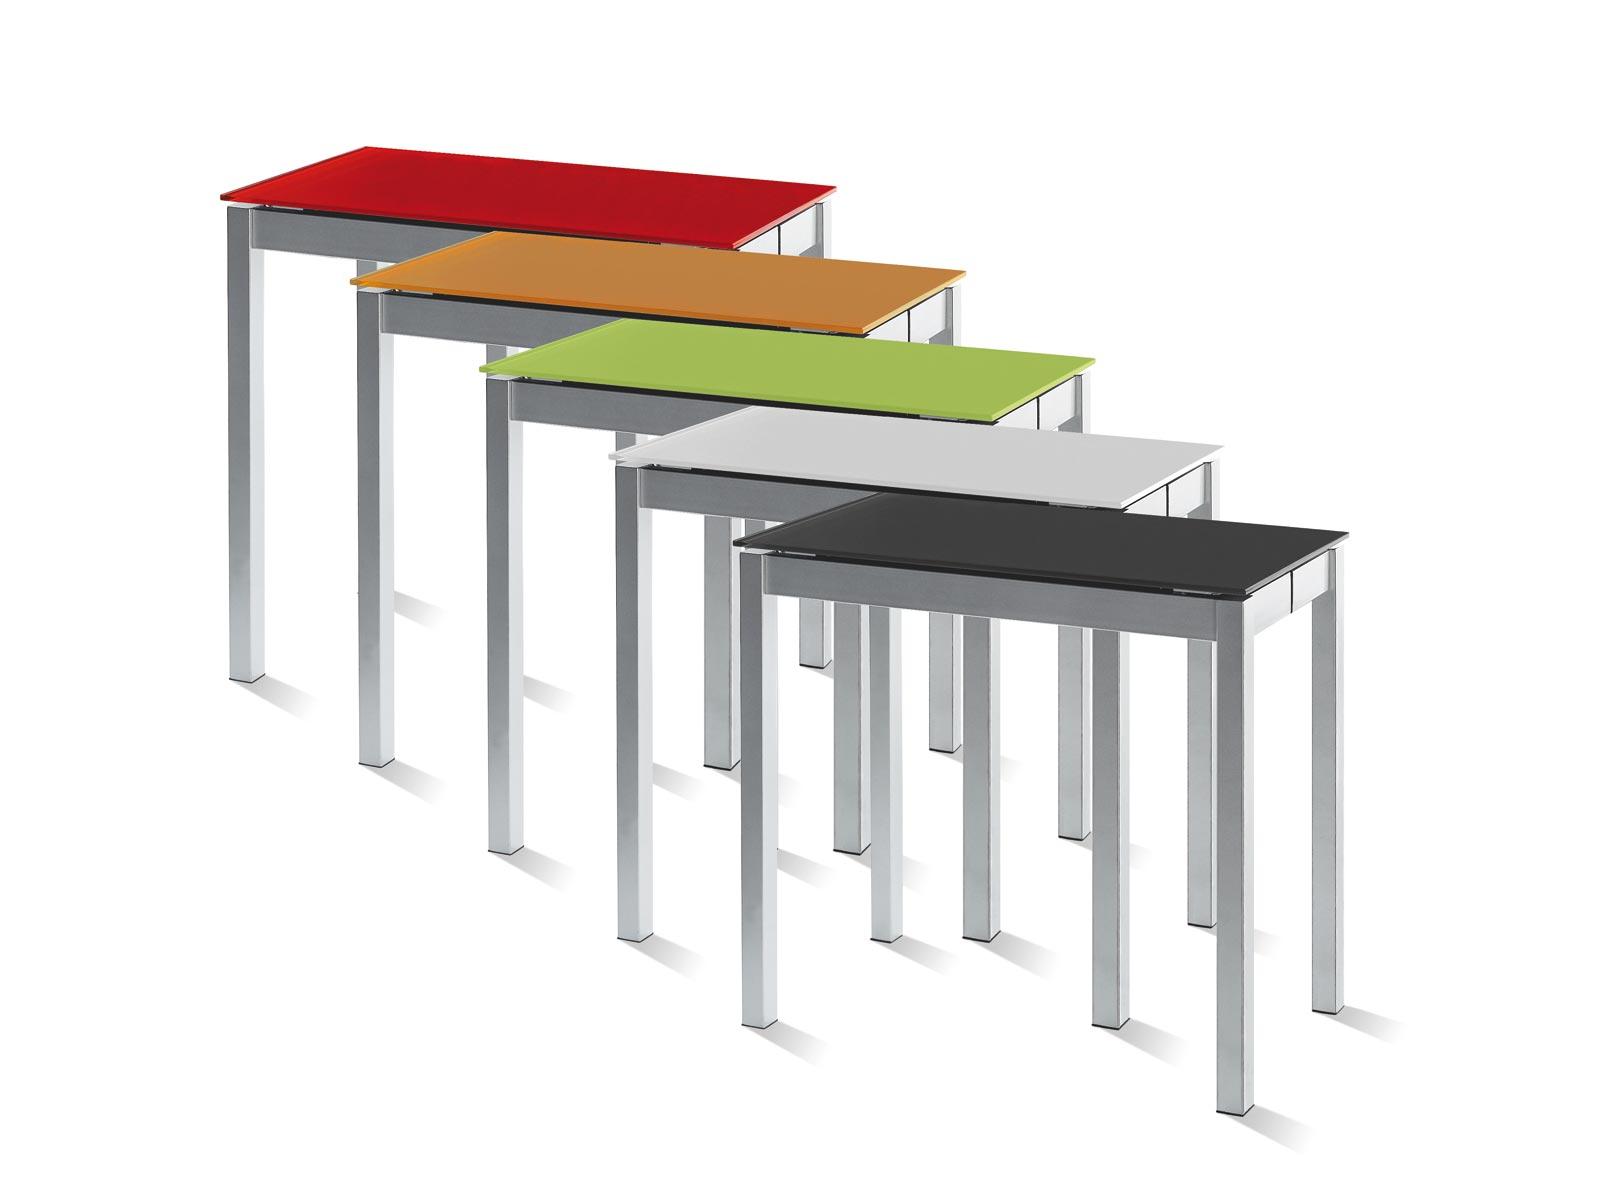 Mesa de cocina peque a y extensible - Mesa rinconera para cocina ...